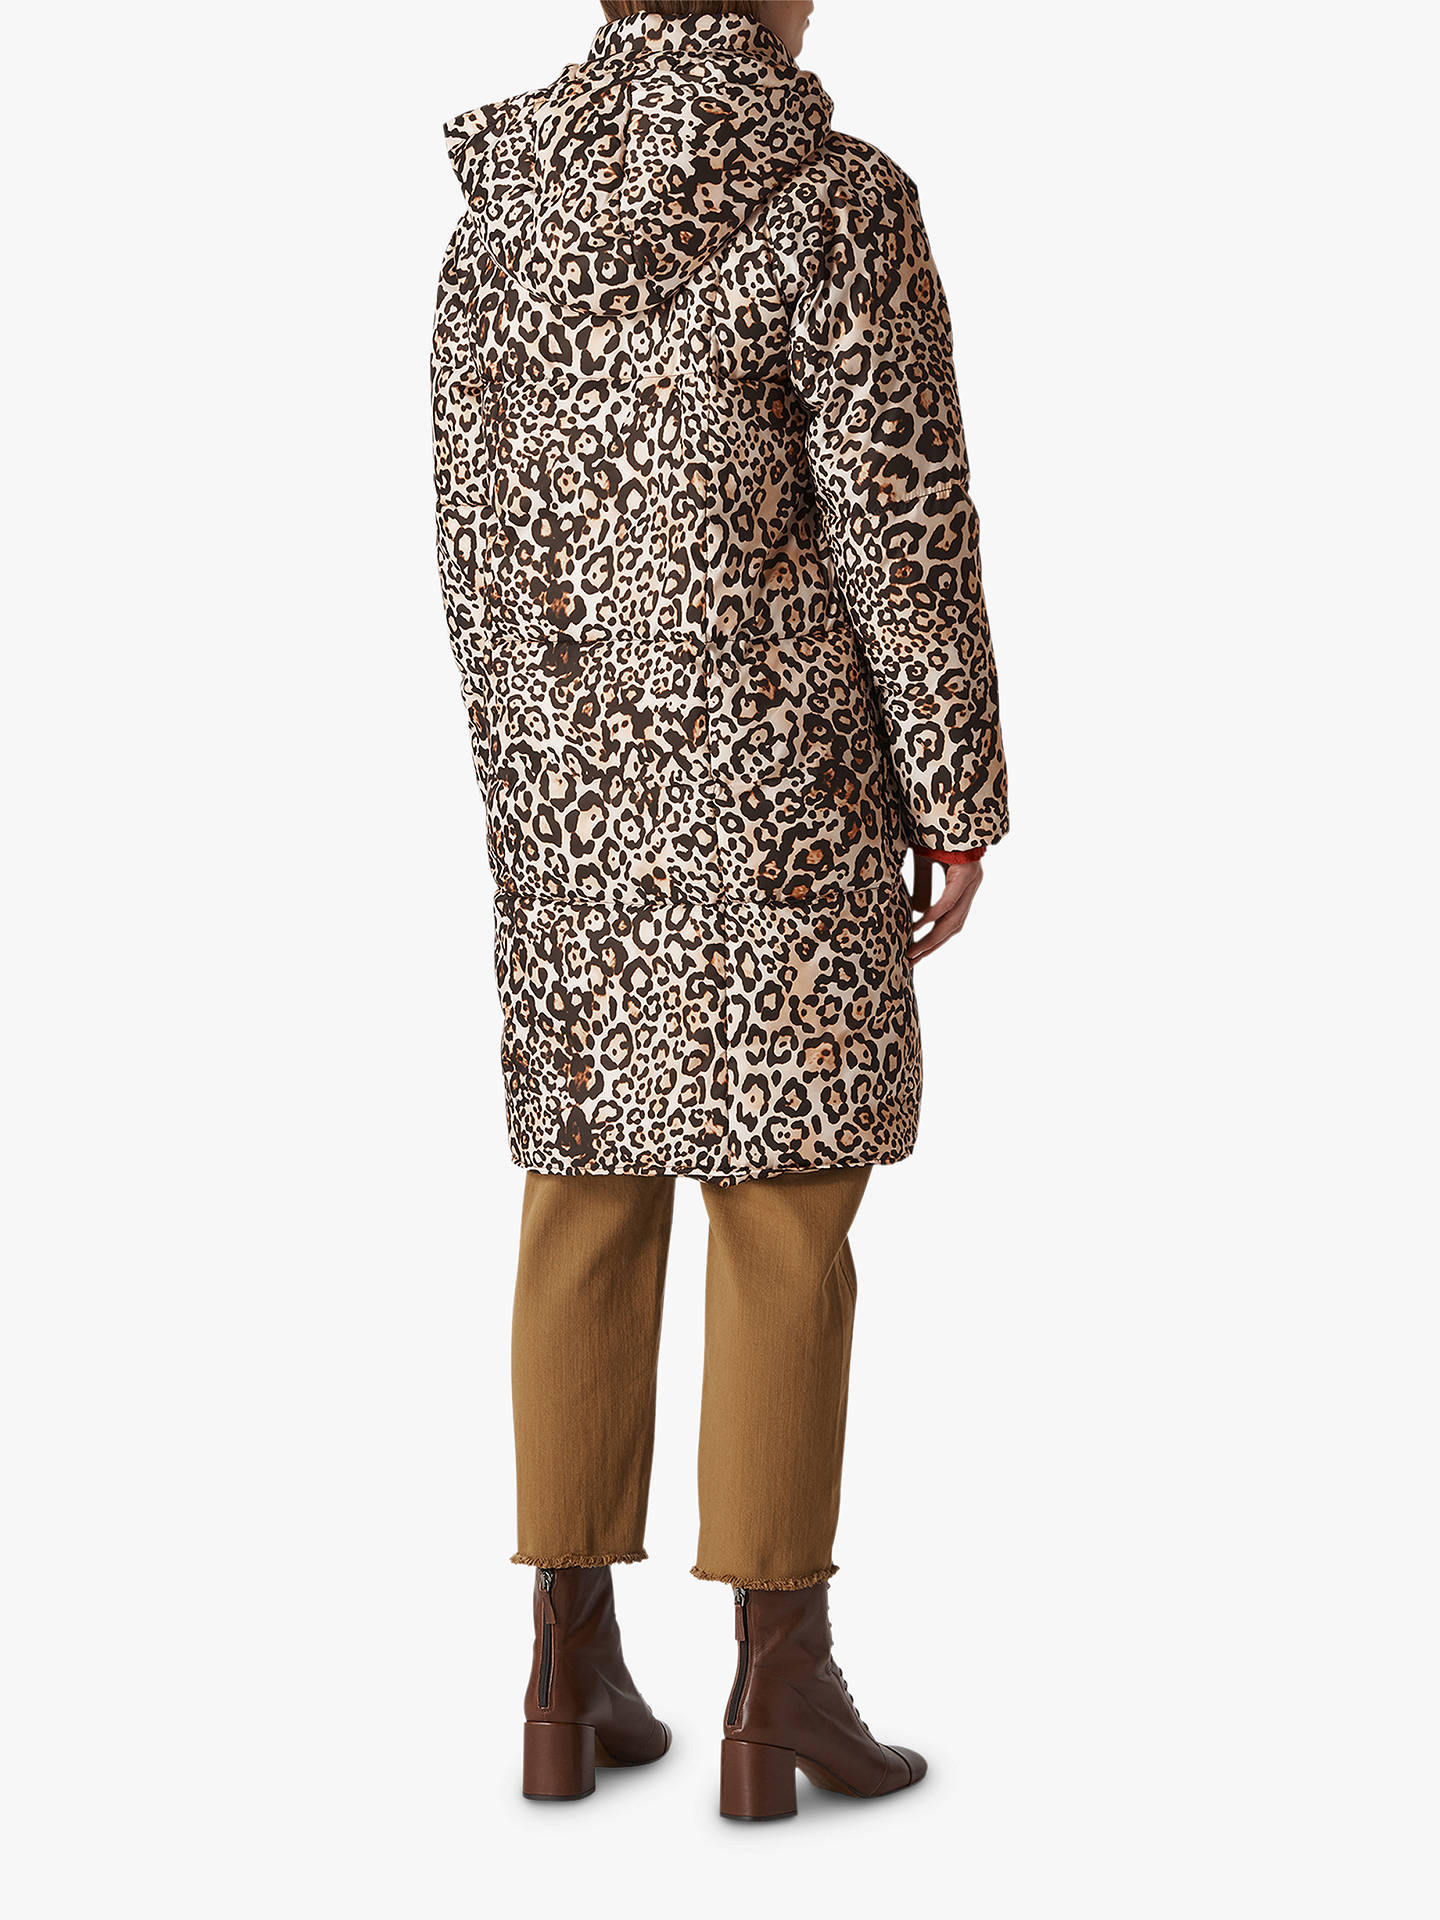 ce754f9b76f4 Buy Whistles Animal Print Longline Puffer Coat, Leopard Print, L Online at  johnlewis.